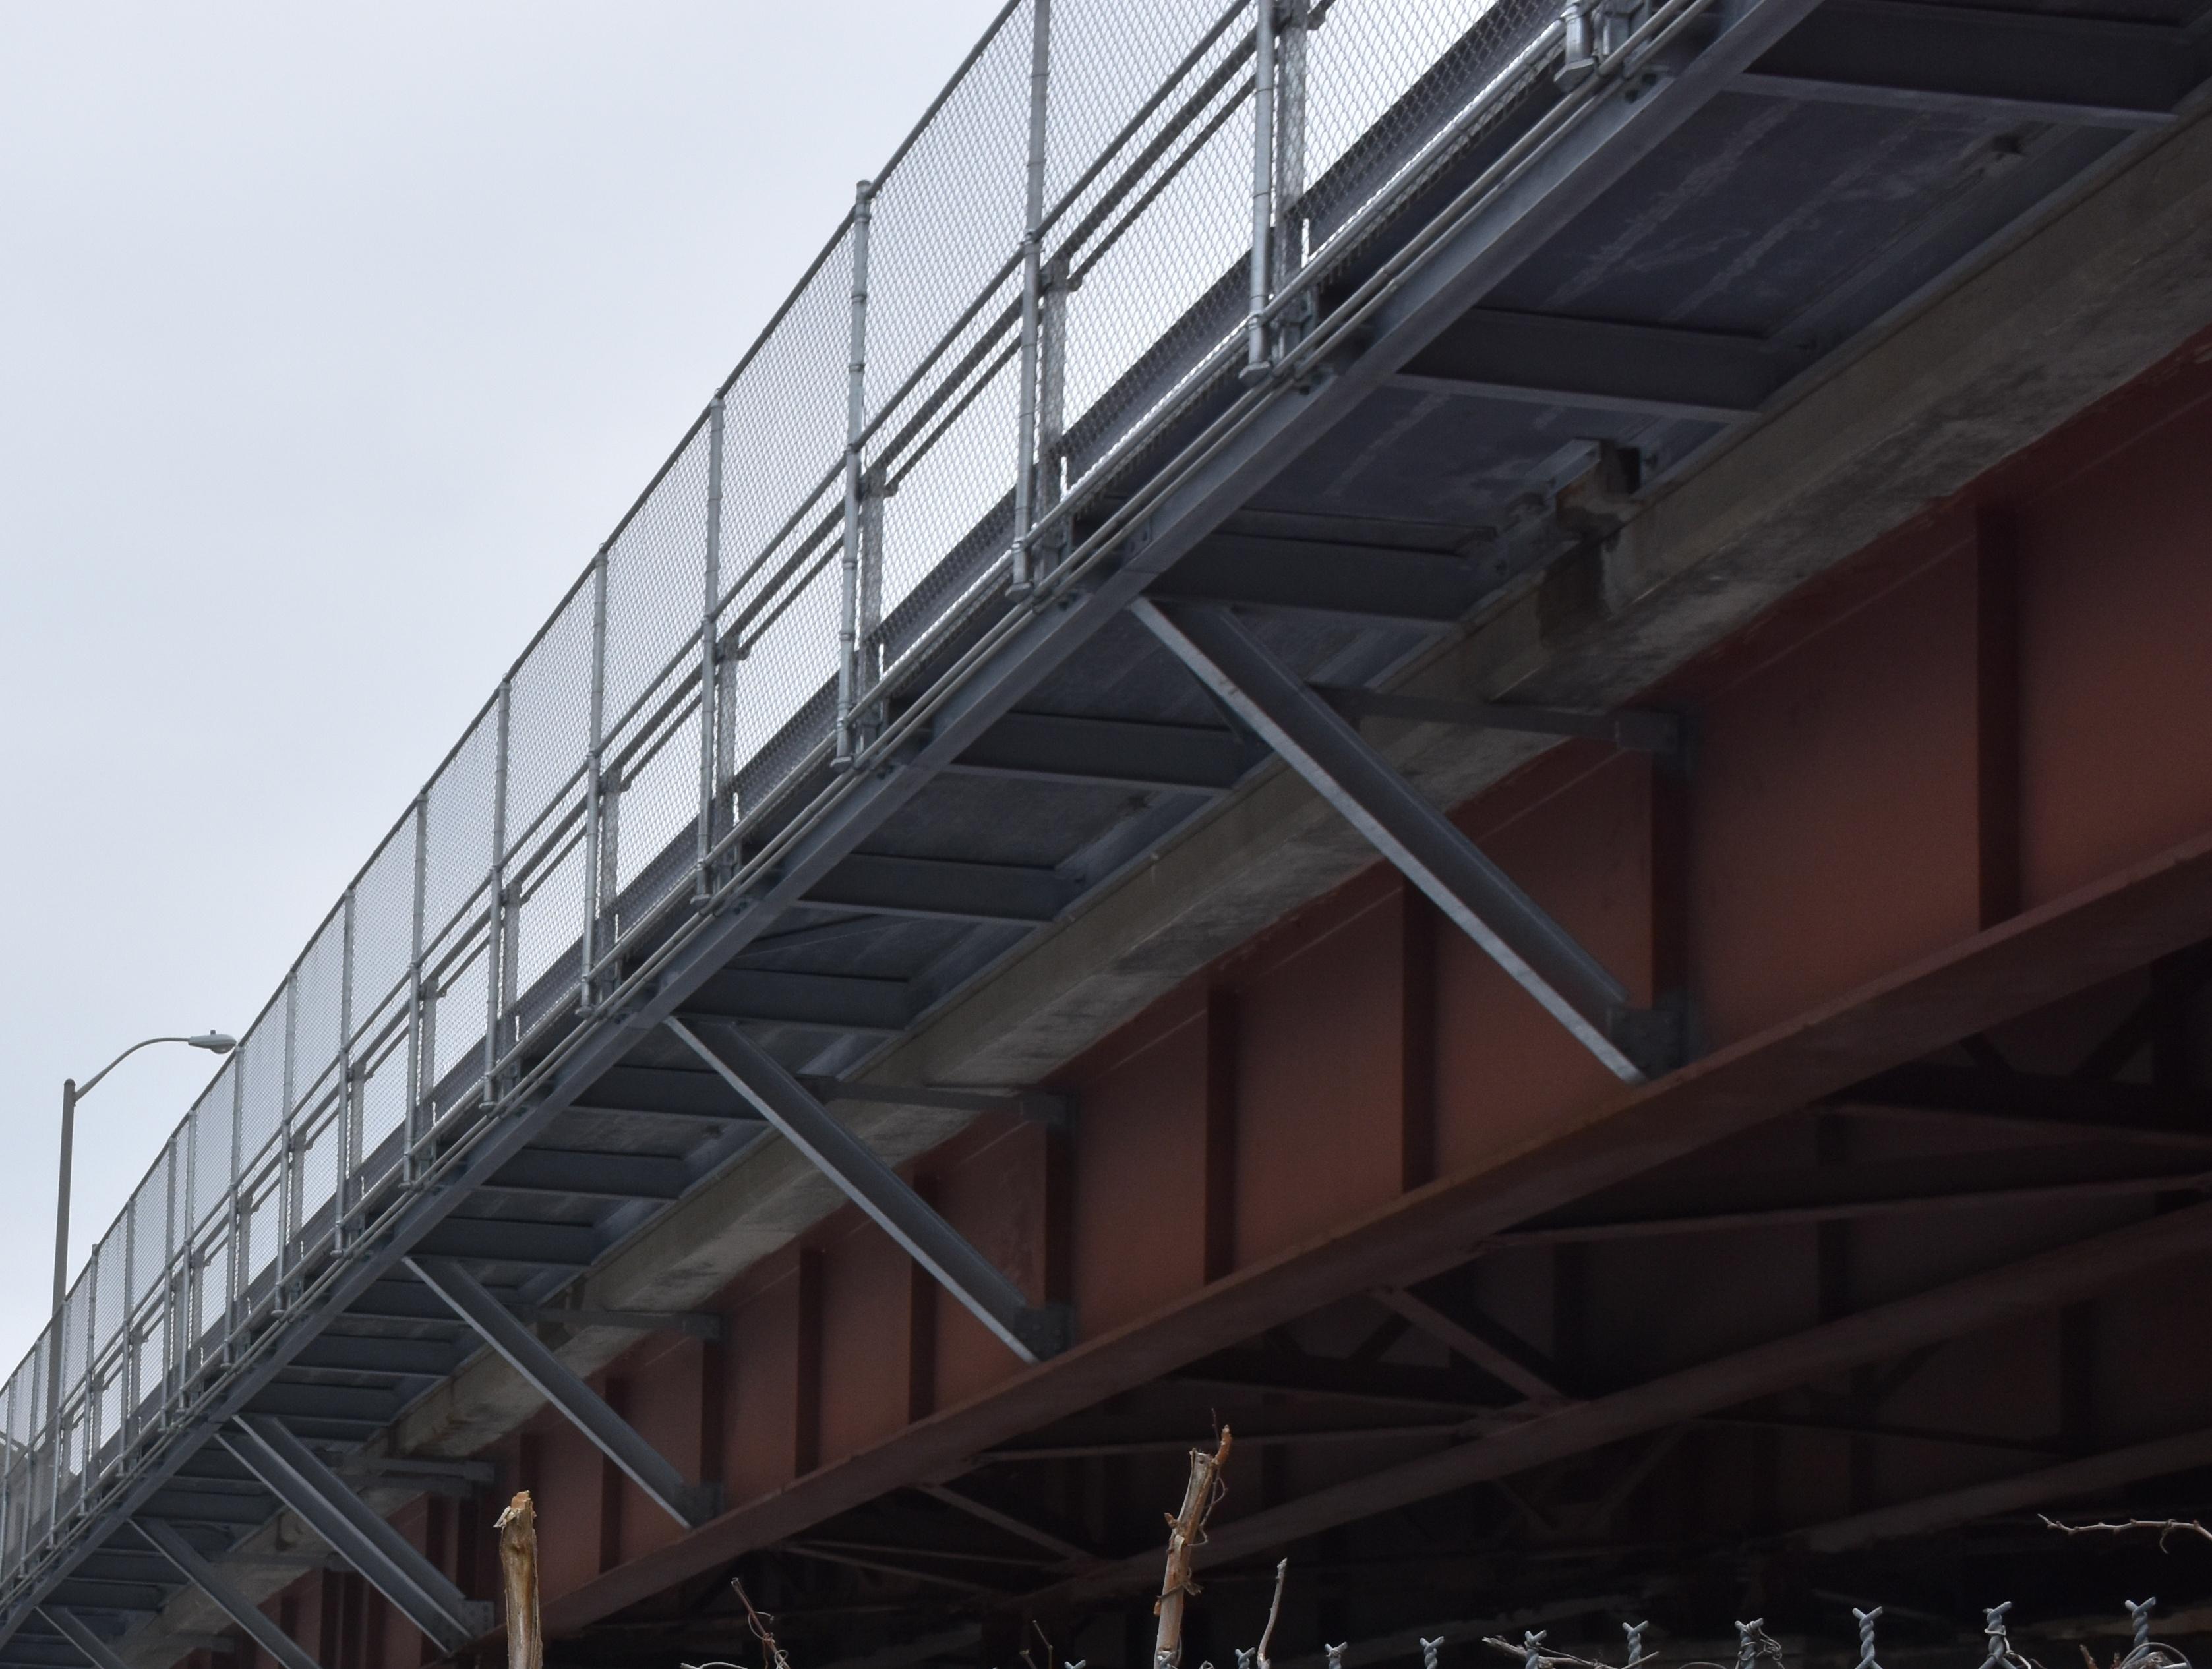 7 - Underside of bridge with railing